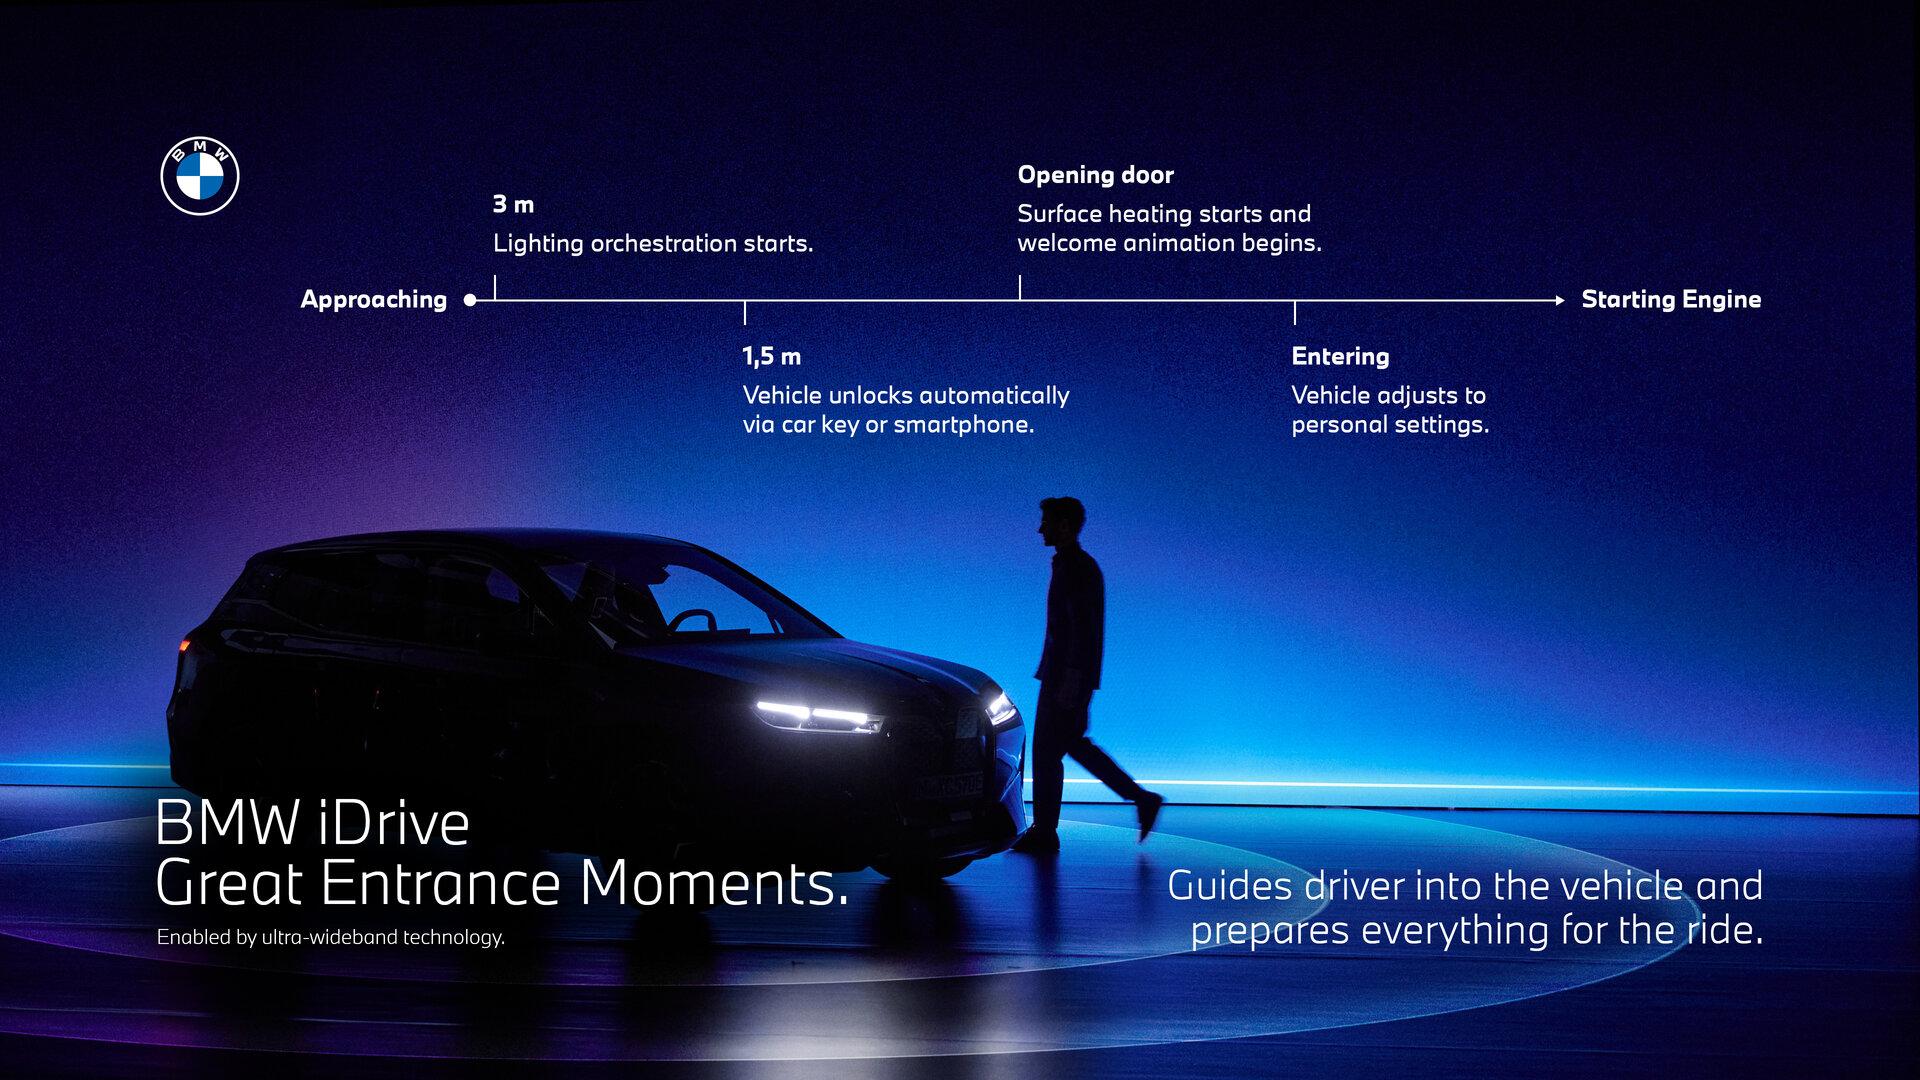 BMW iDrive – Great Entrance Moments